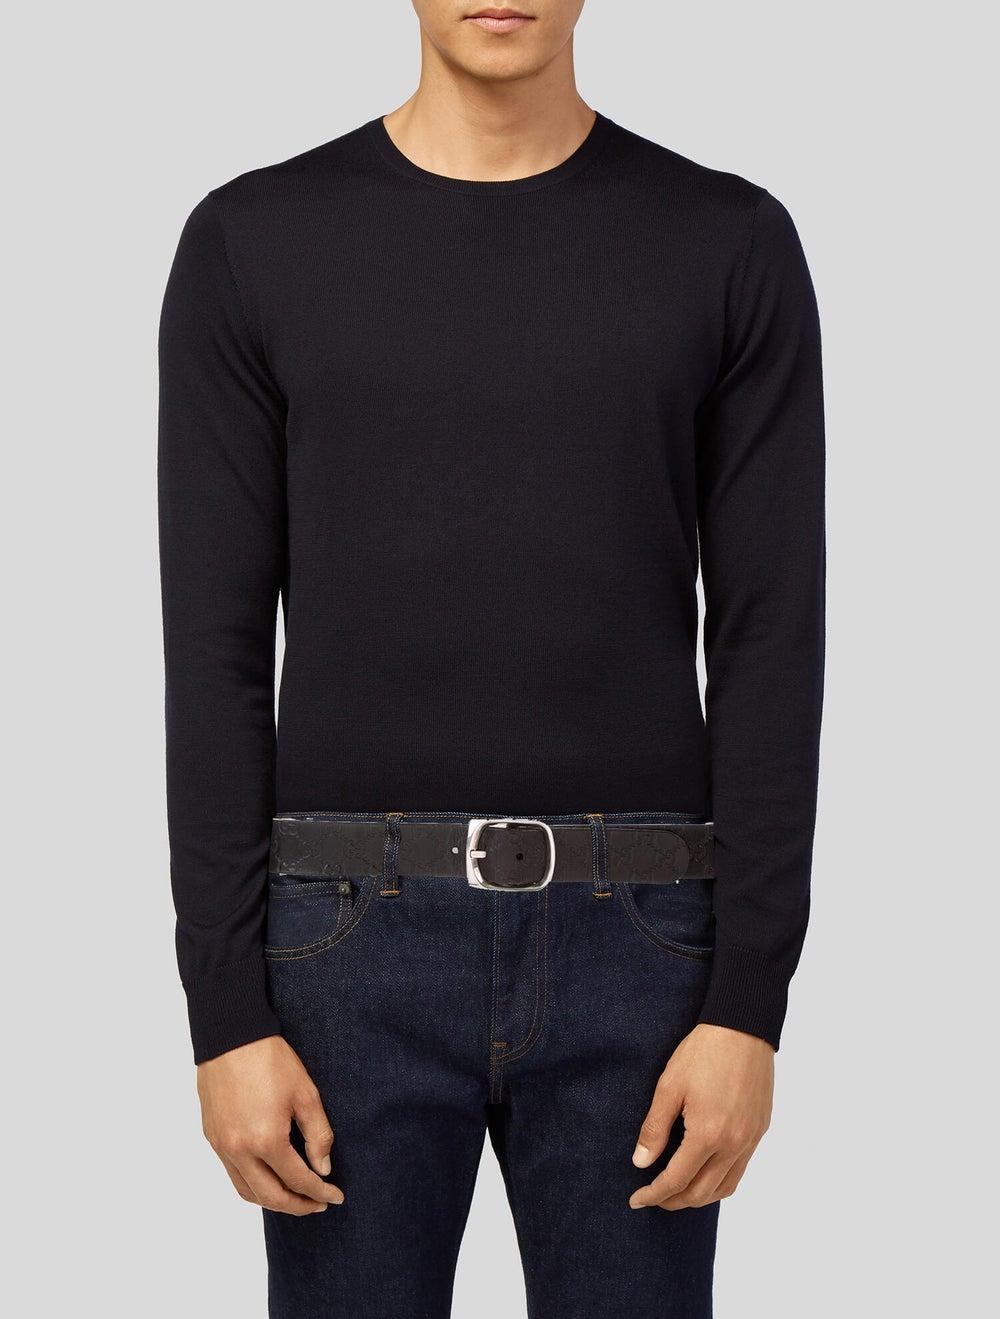 Gucci Signature Leather Belt black - image 2